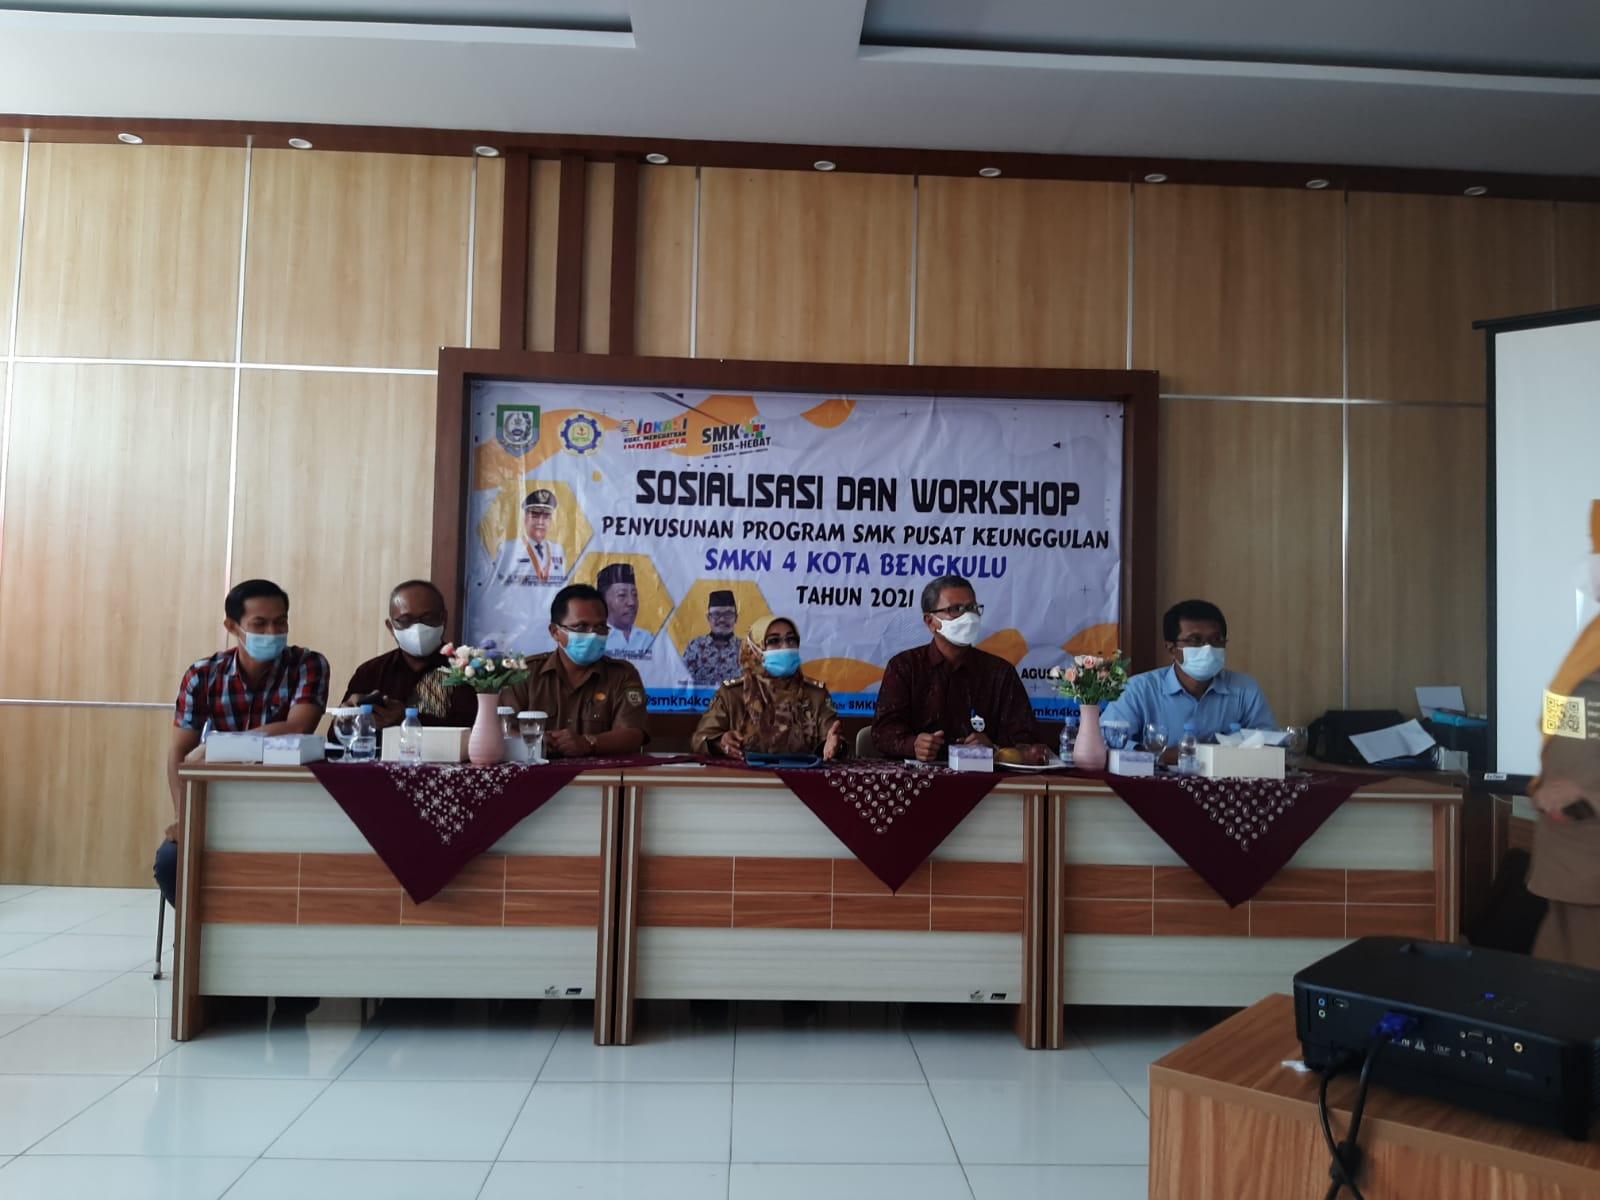 SOSIALISASI DAN WORKSHOP PENYUSUNAN PROGRAM SMK PK